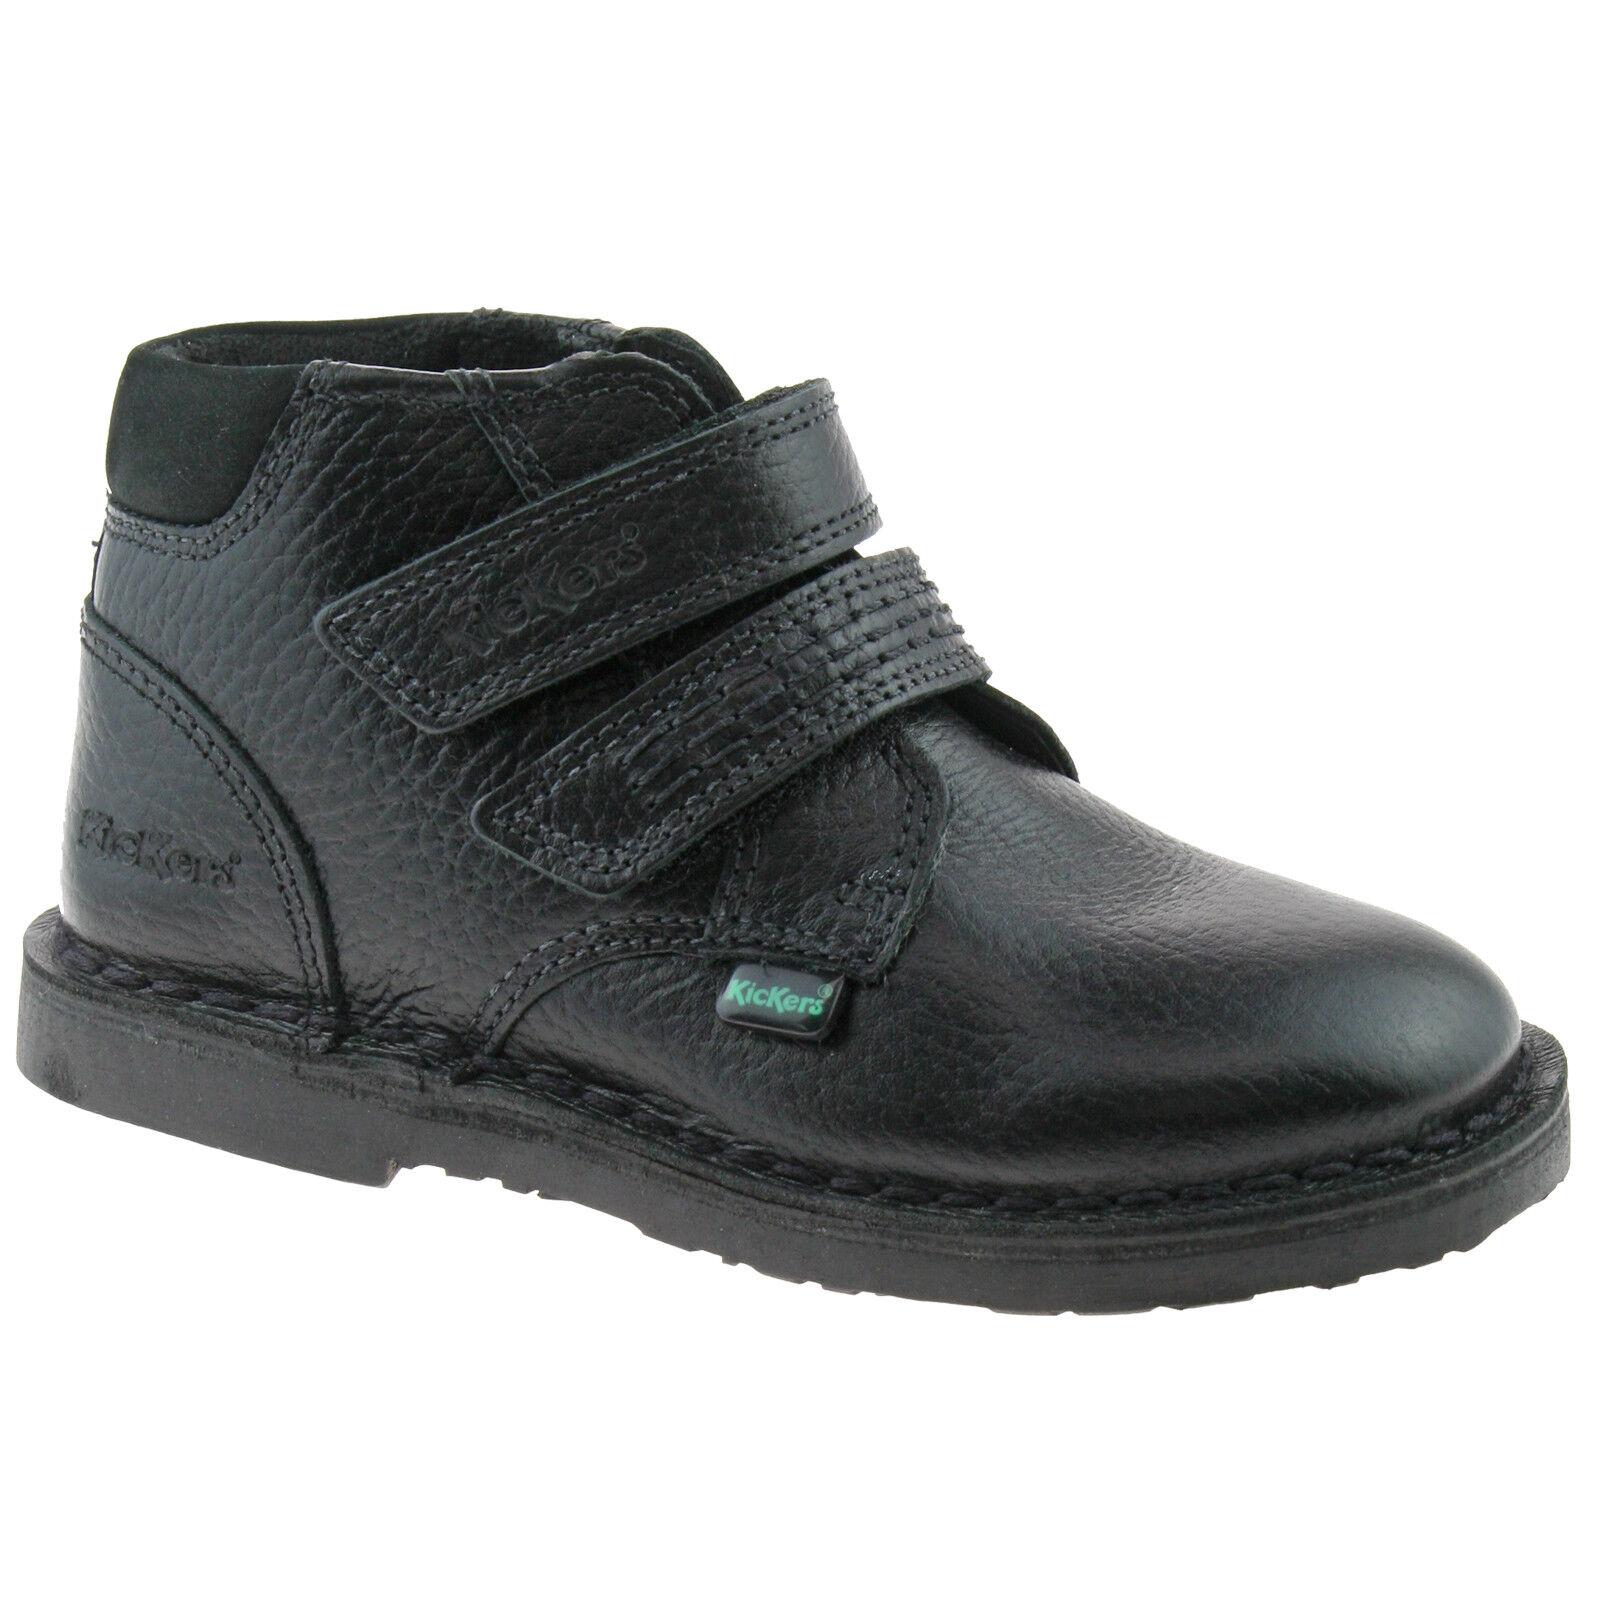 Adlar details about boys infants kickers adlar twin black leather boots sizes 5 -  12 1-14171